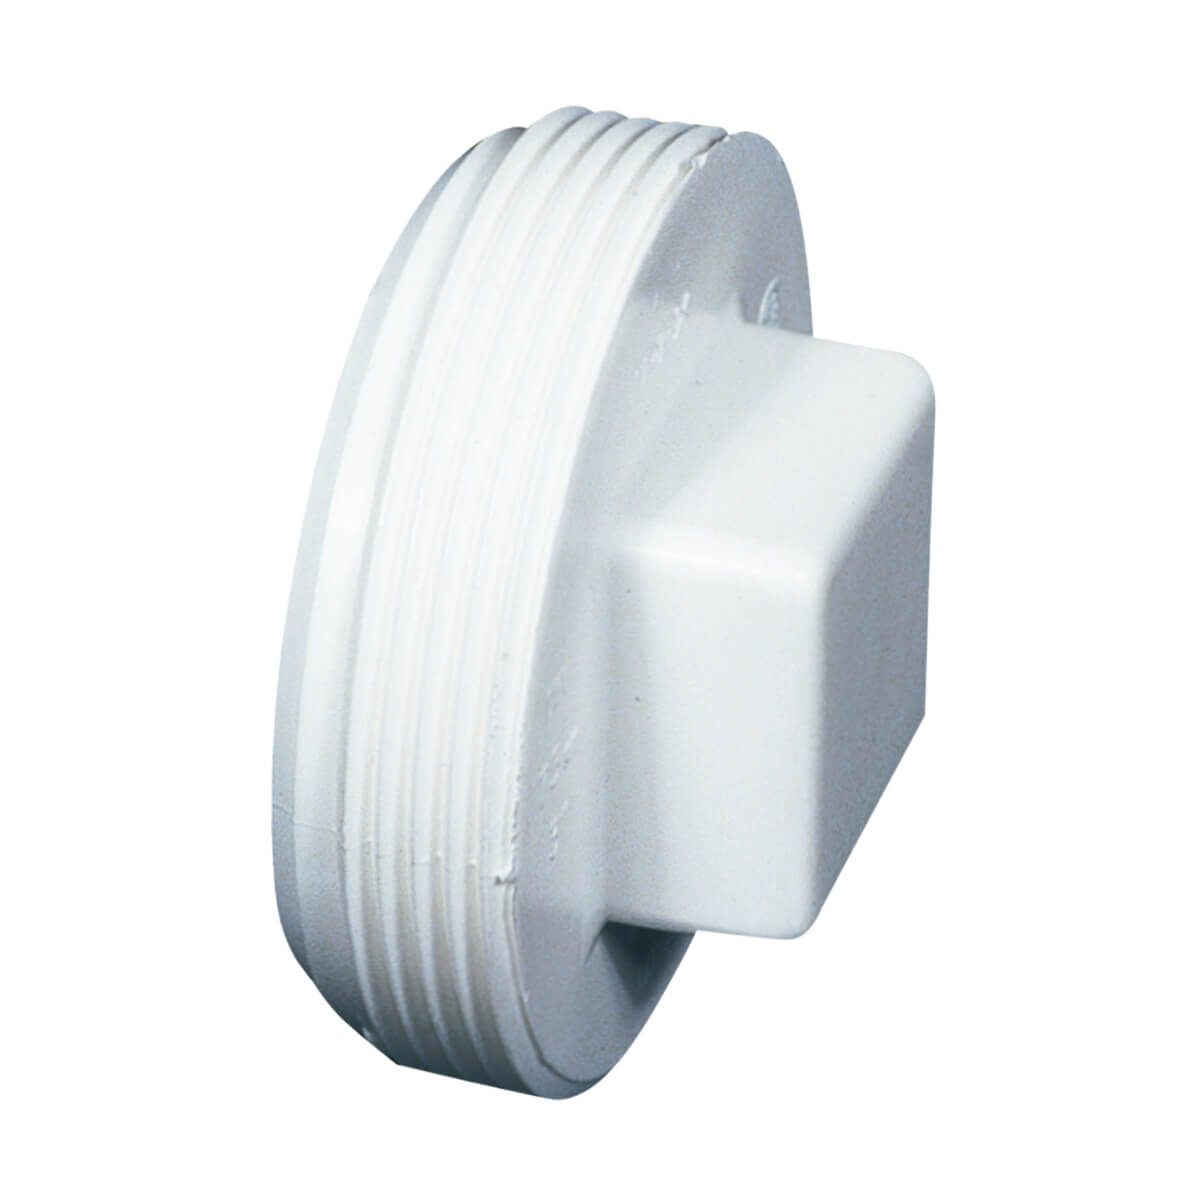 PVC-BDS Cleanout Plug - MPT - 4-in